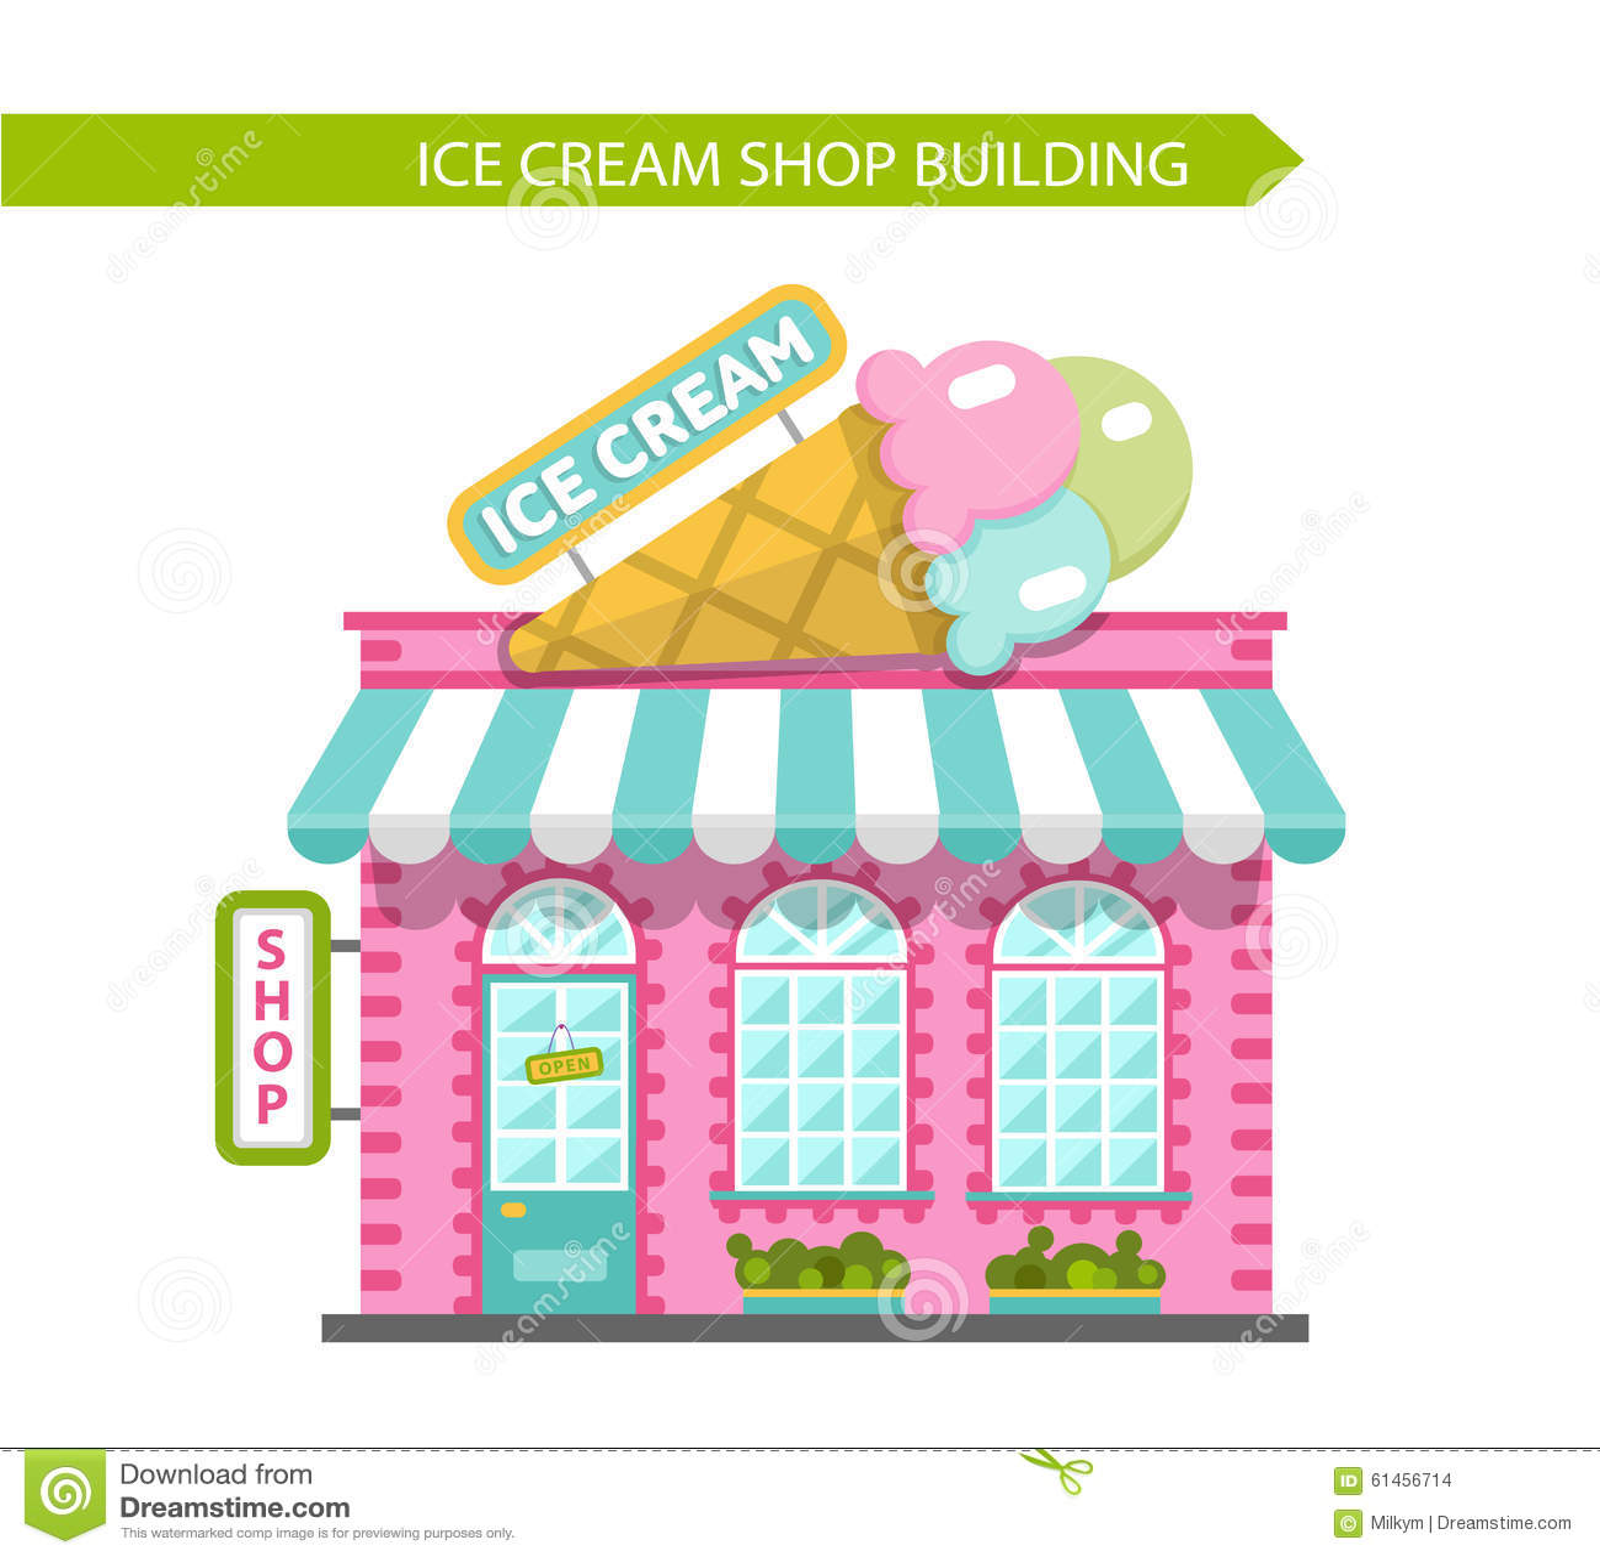 Popular Ice Cream Wallpaper Buy Cheap Ice Cream Wallpaper: Vector Illustration Of Ice Cream Shop Building Cartoon